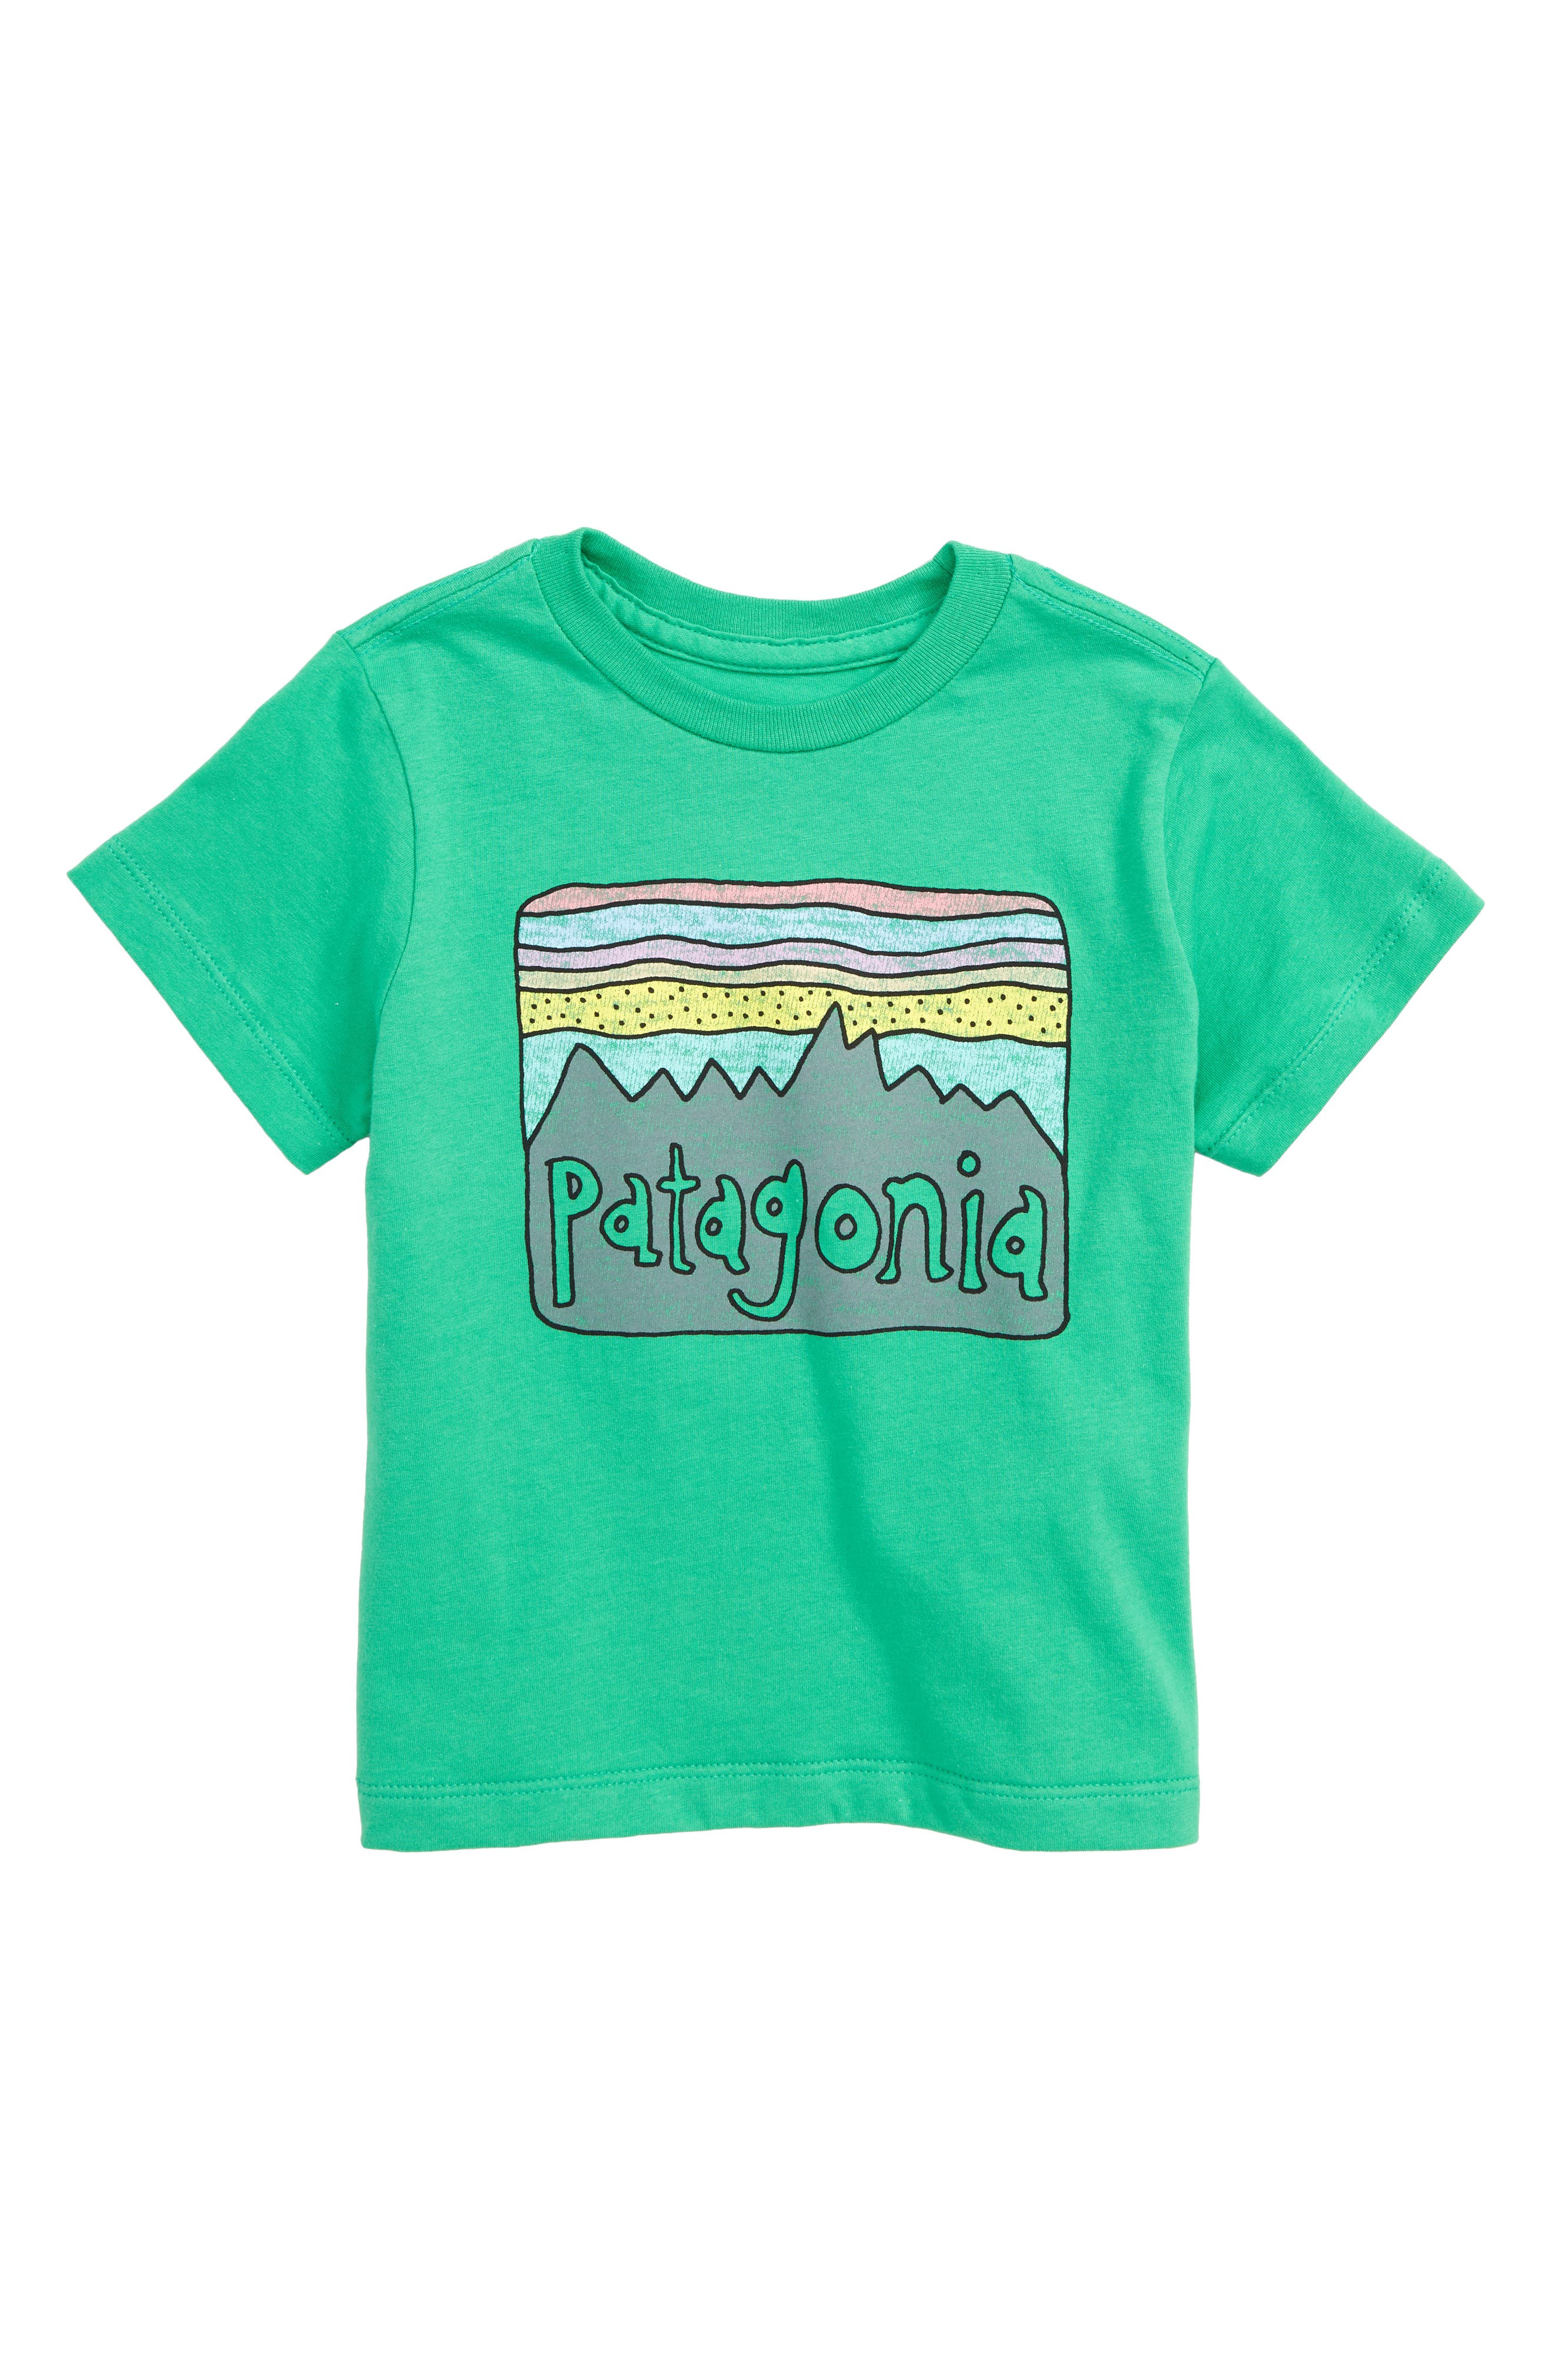 PATAGONIA, Fitz Roy Skies Graphic Organic Cotton T-Shirt, Main thumbnail 1, color, 300